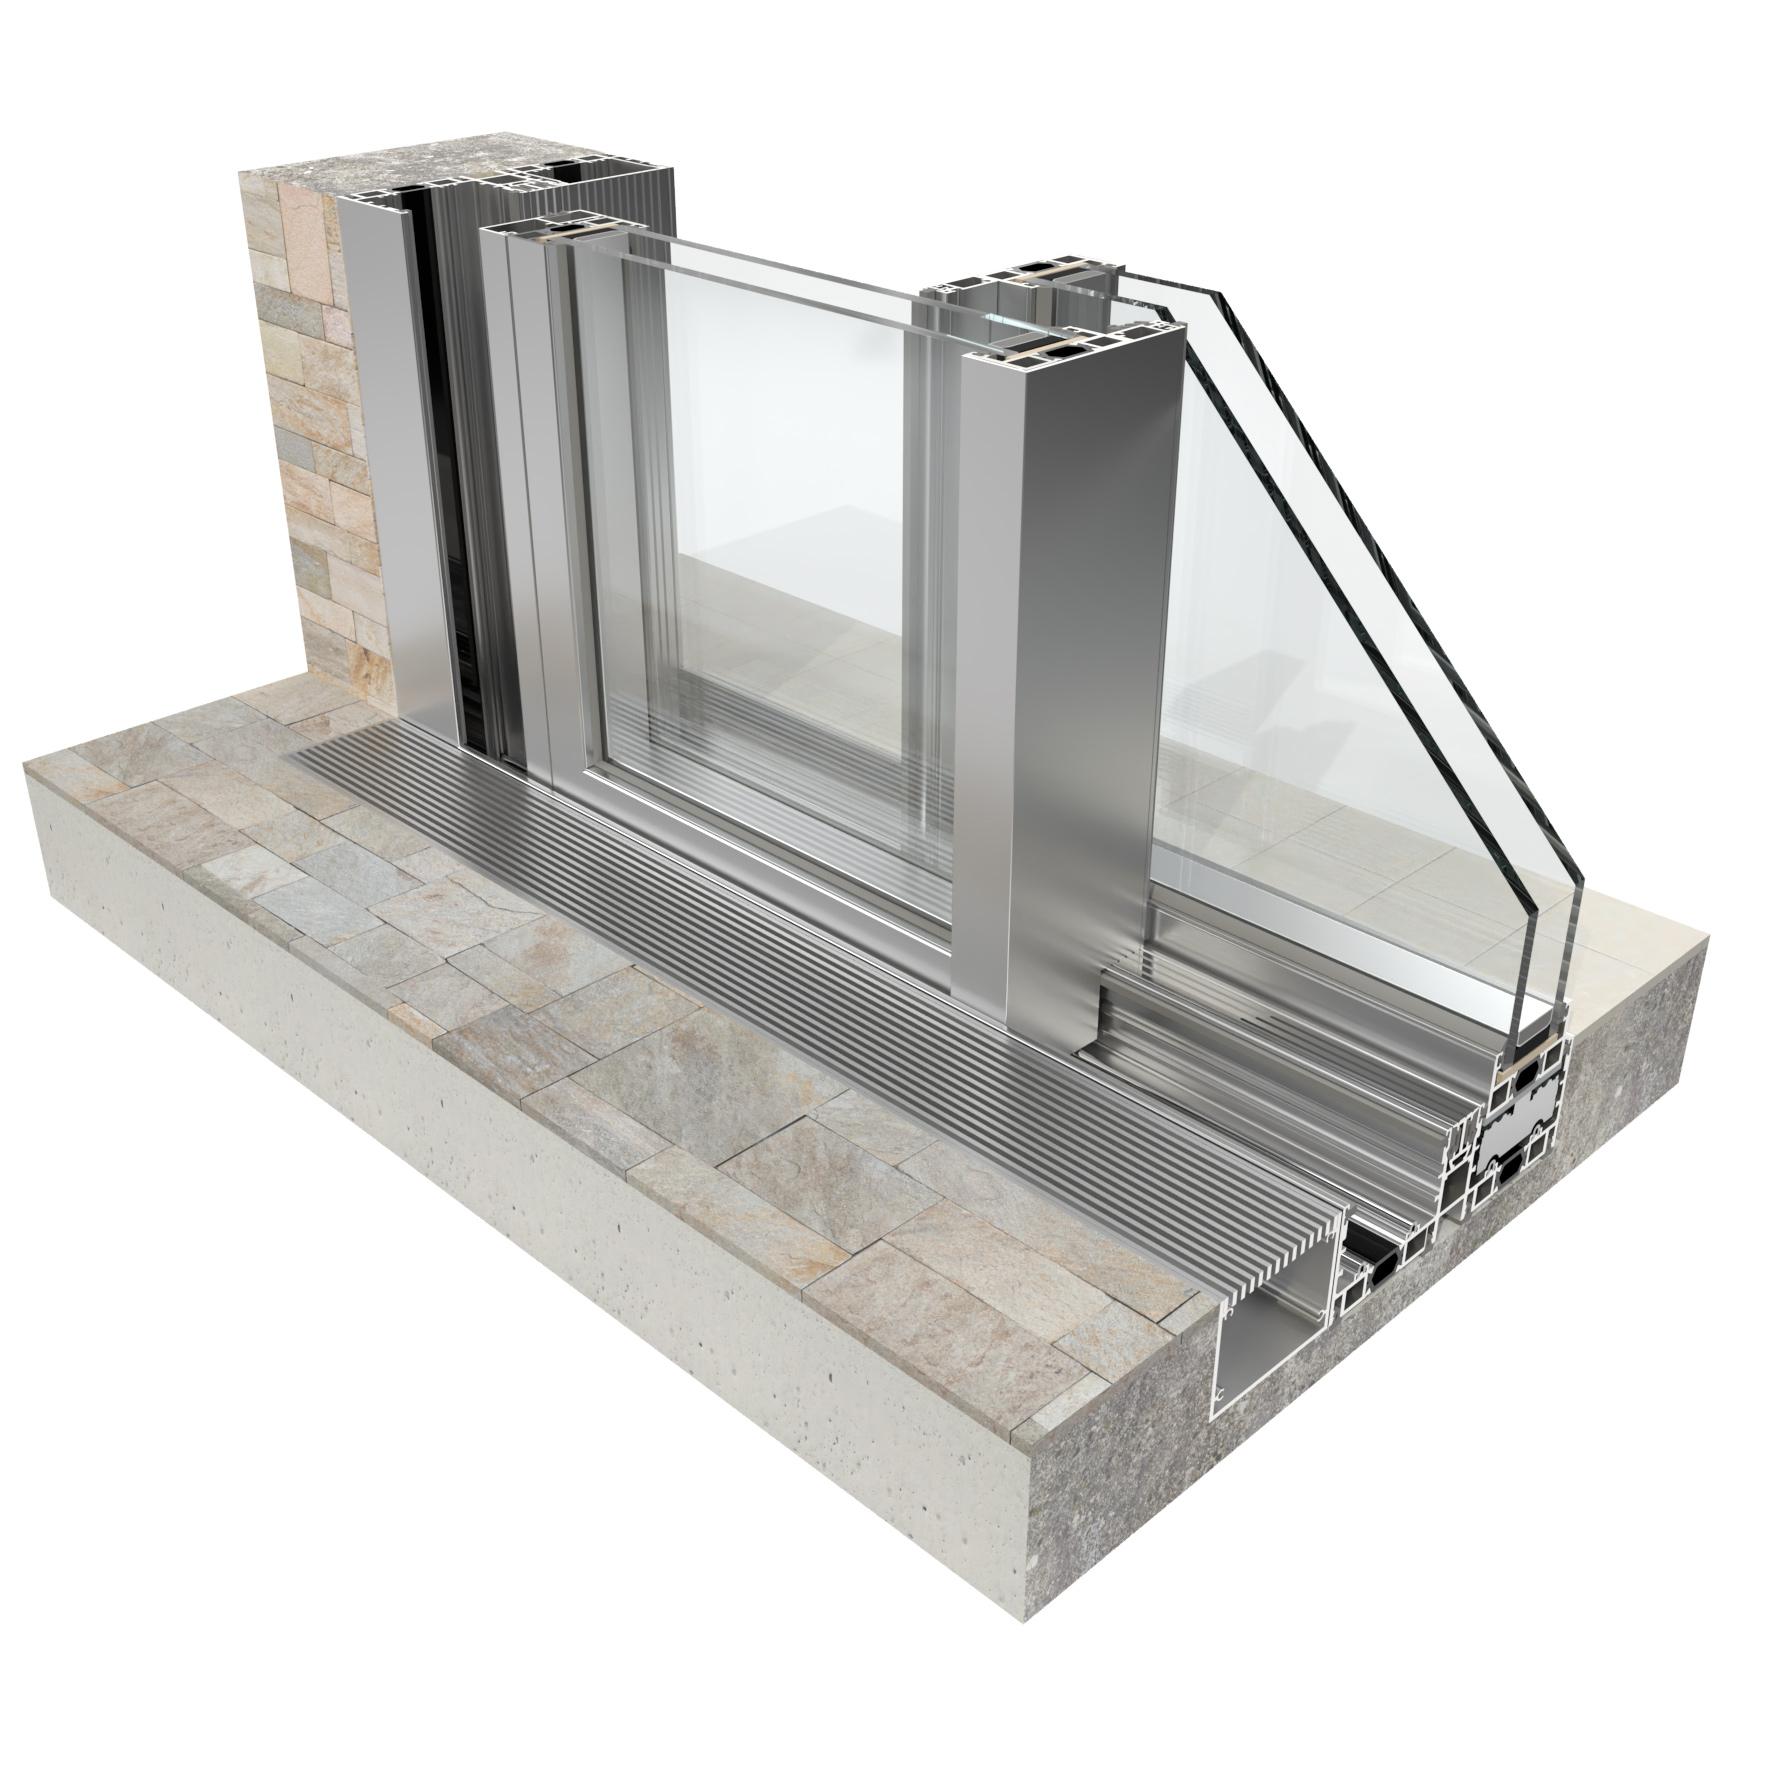 https://www.allpaint.it/wp-content/uploads/2021/07/scorrevoli-alluminio-smartline-open-allpaint.jpg